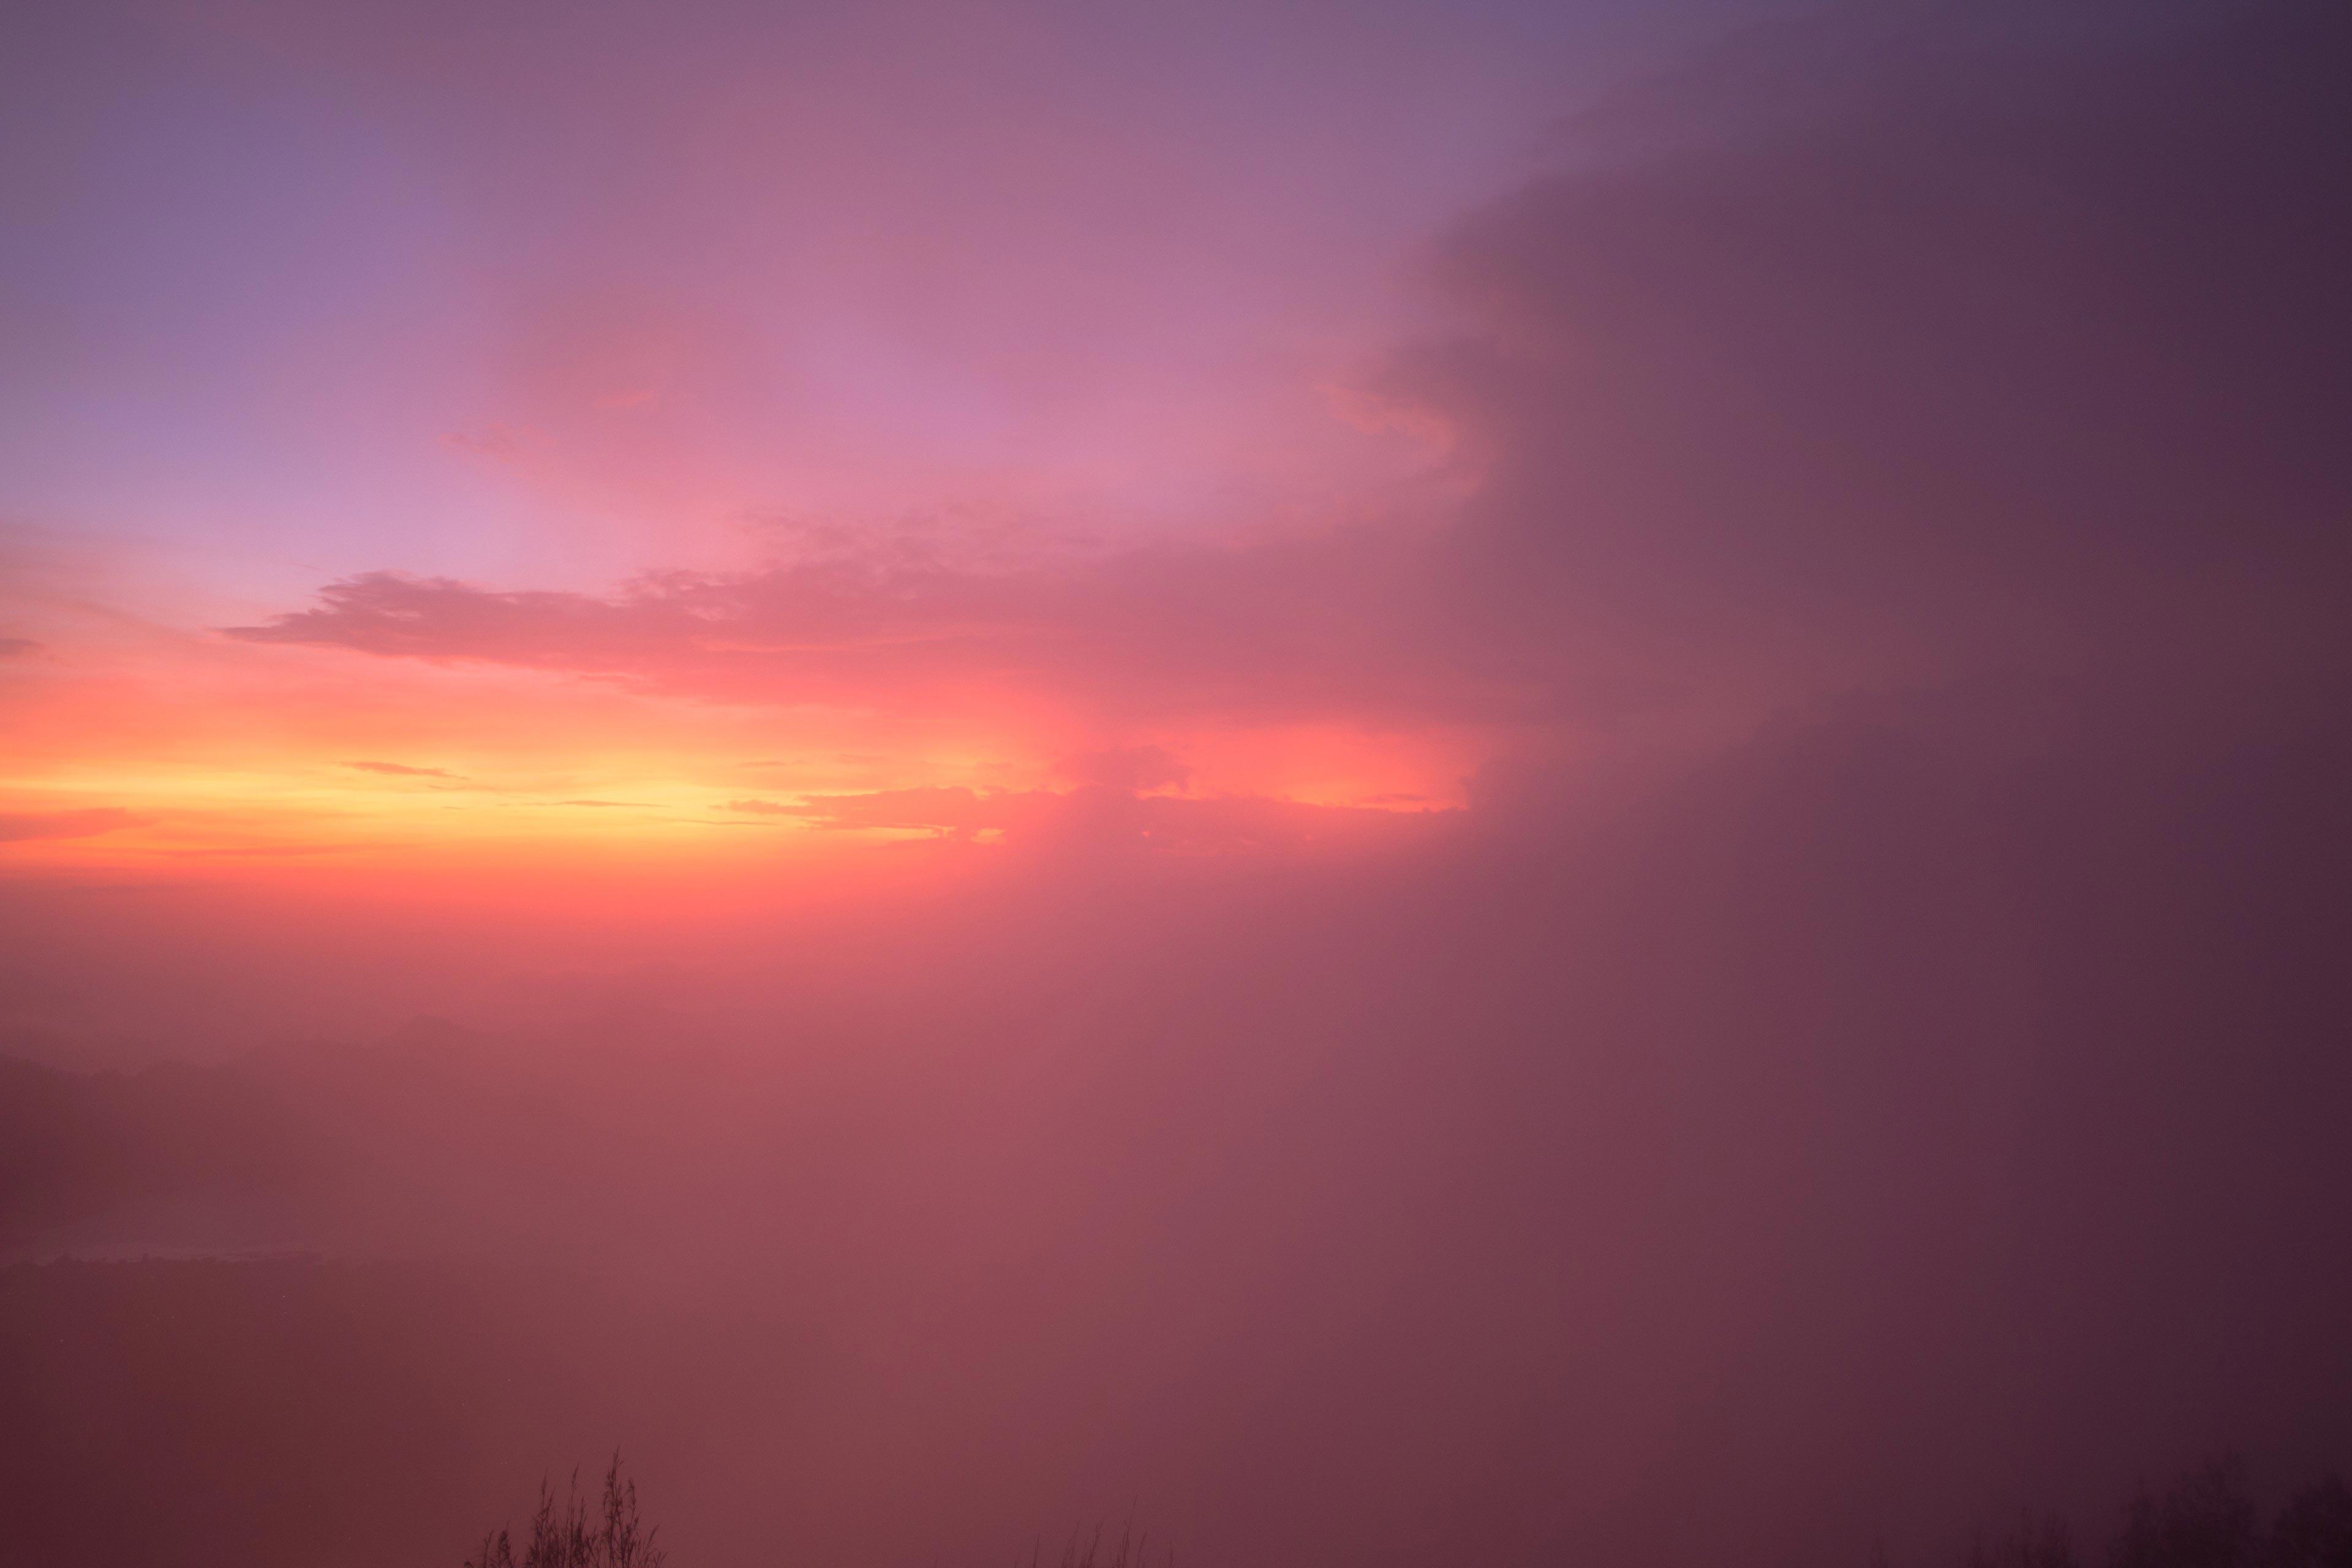 Sunrise Through The Cloud